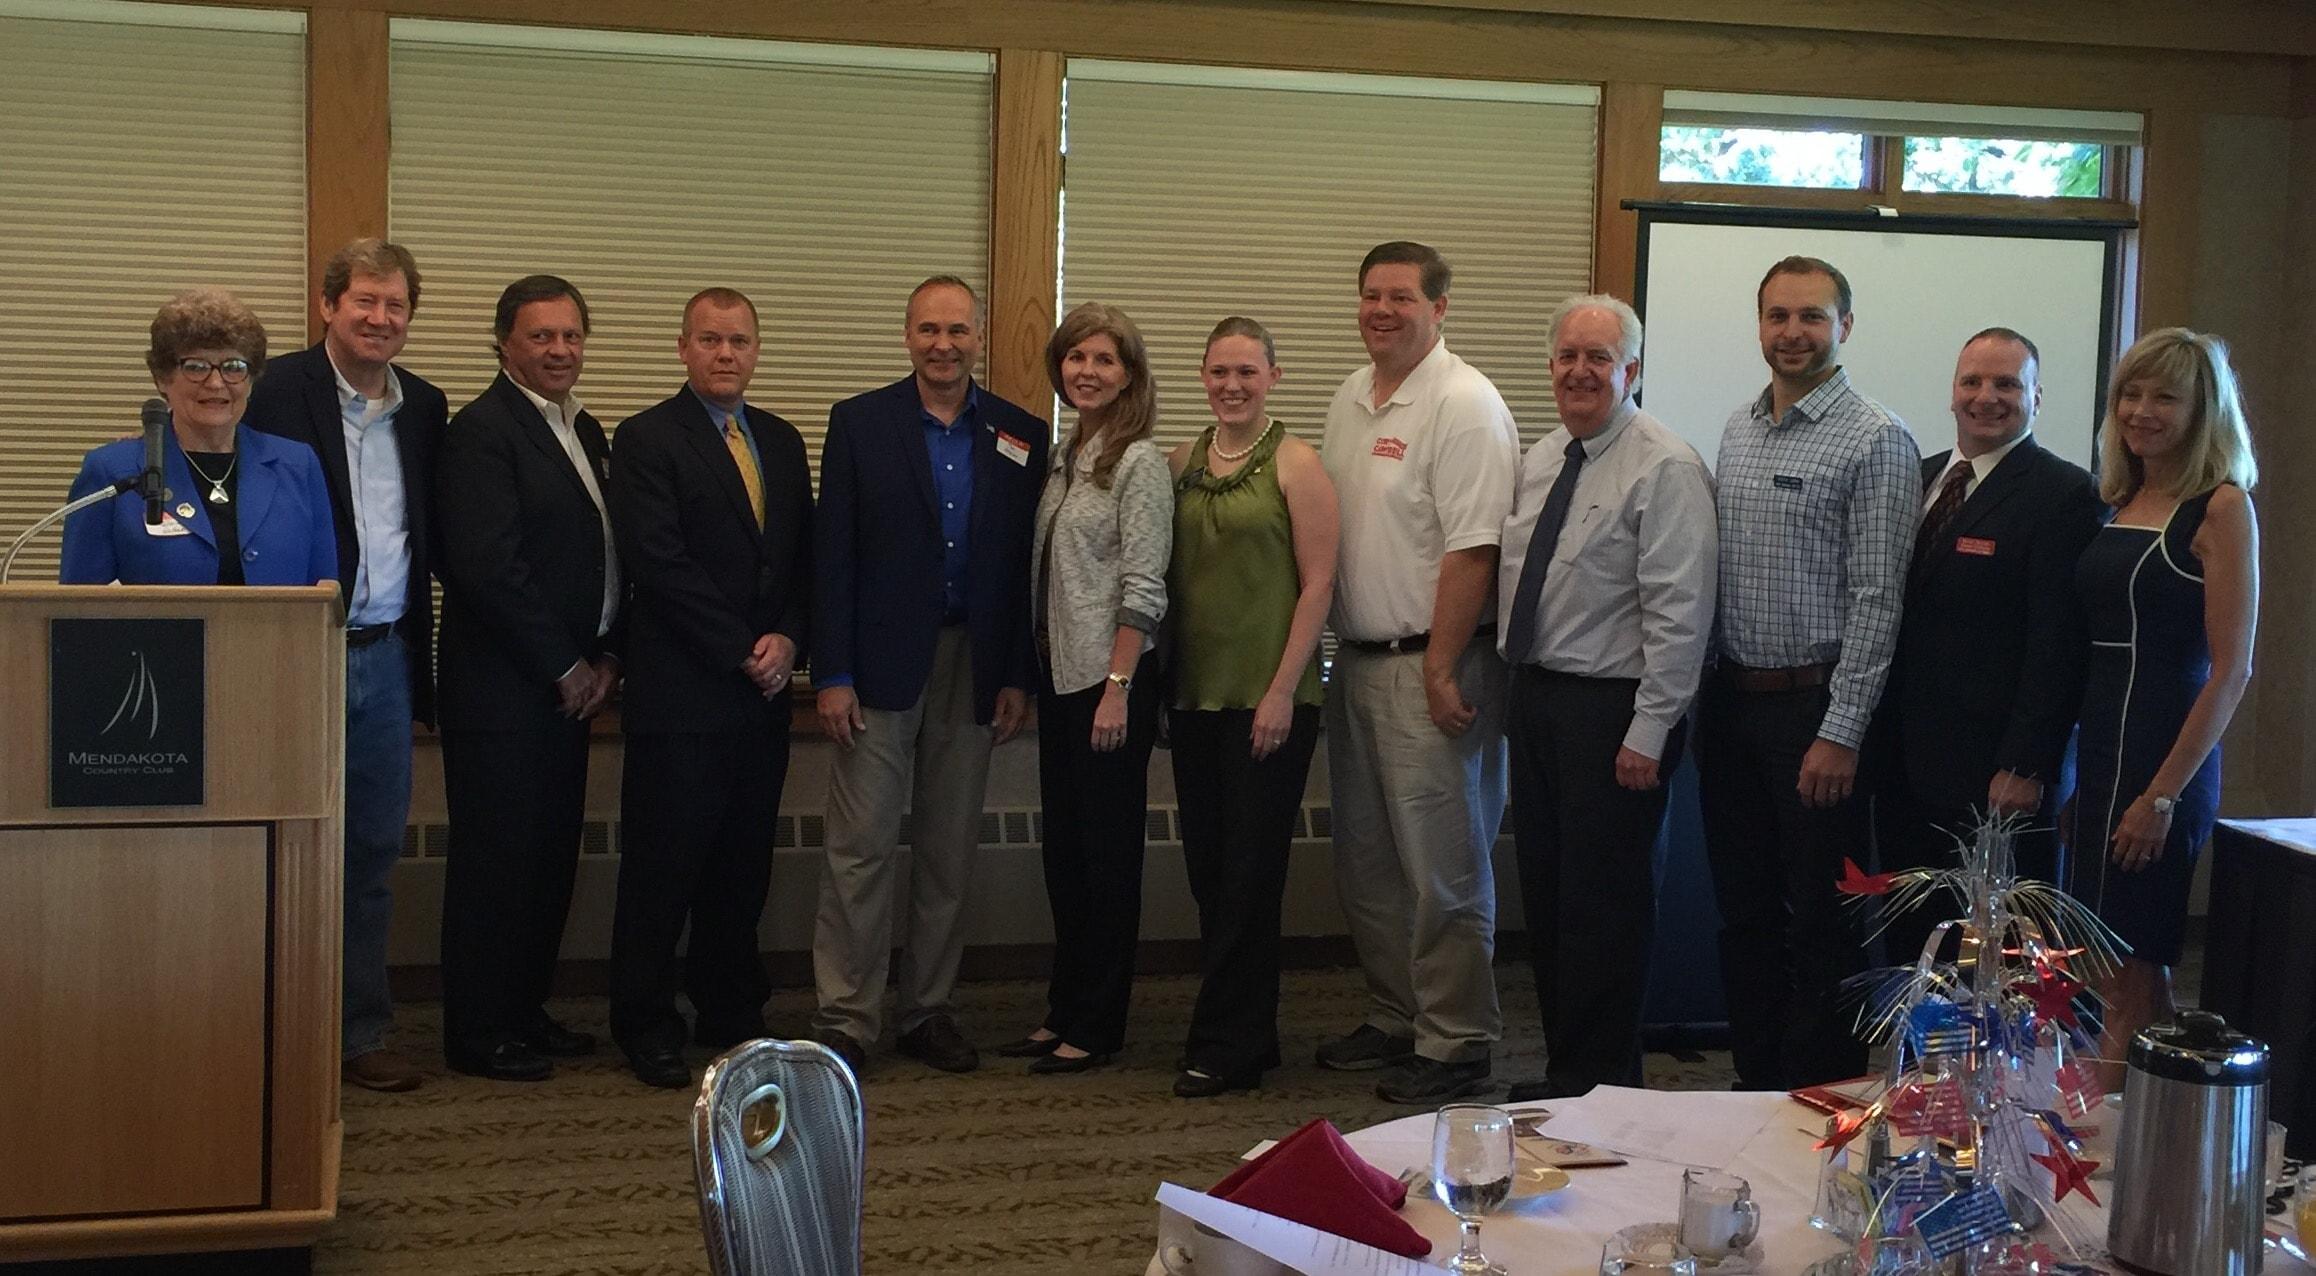 bulletin board metro republican women mn republican candidates